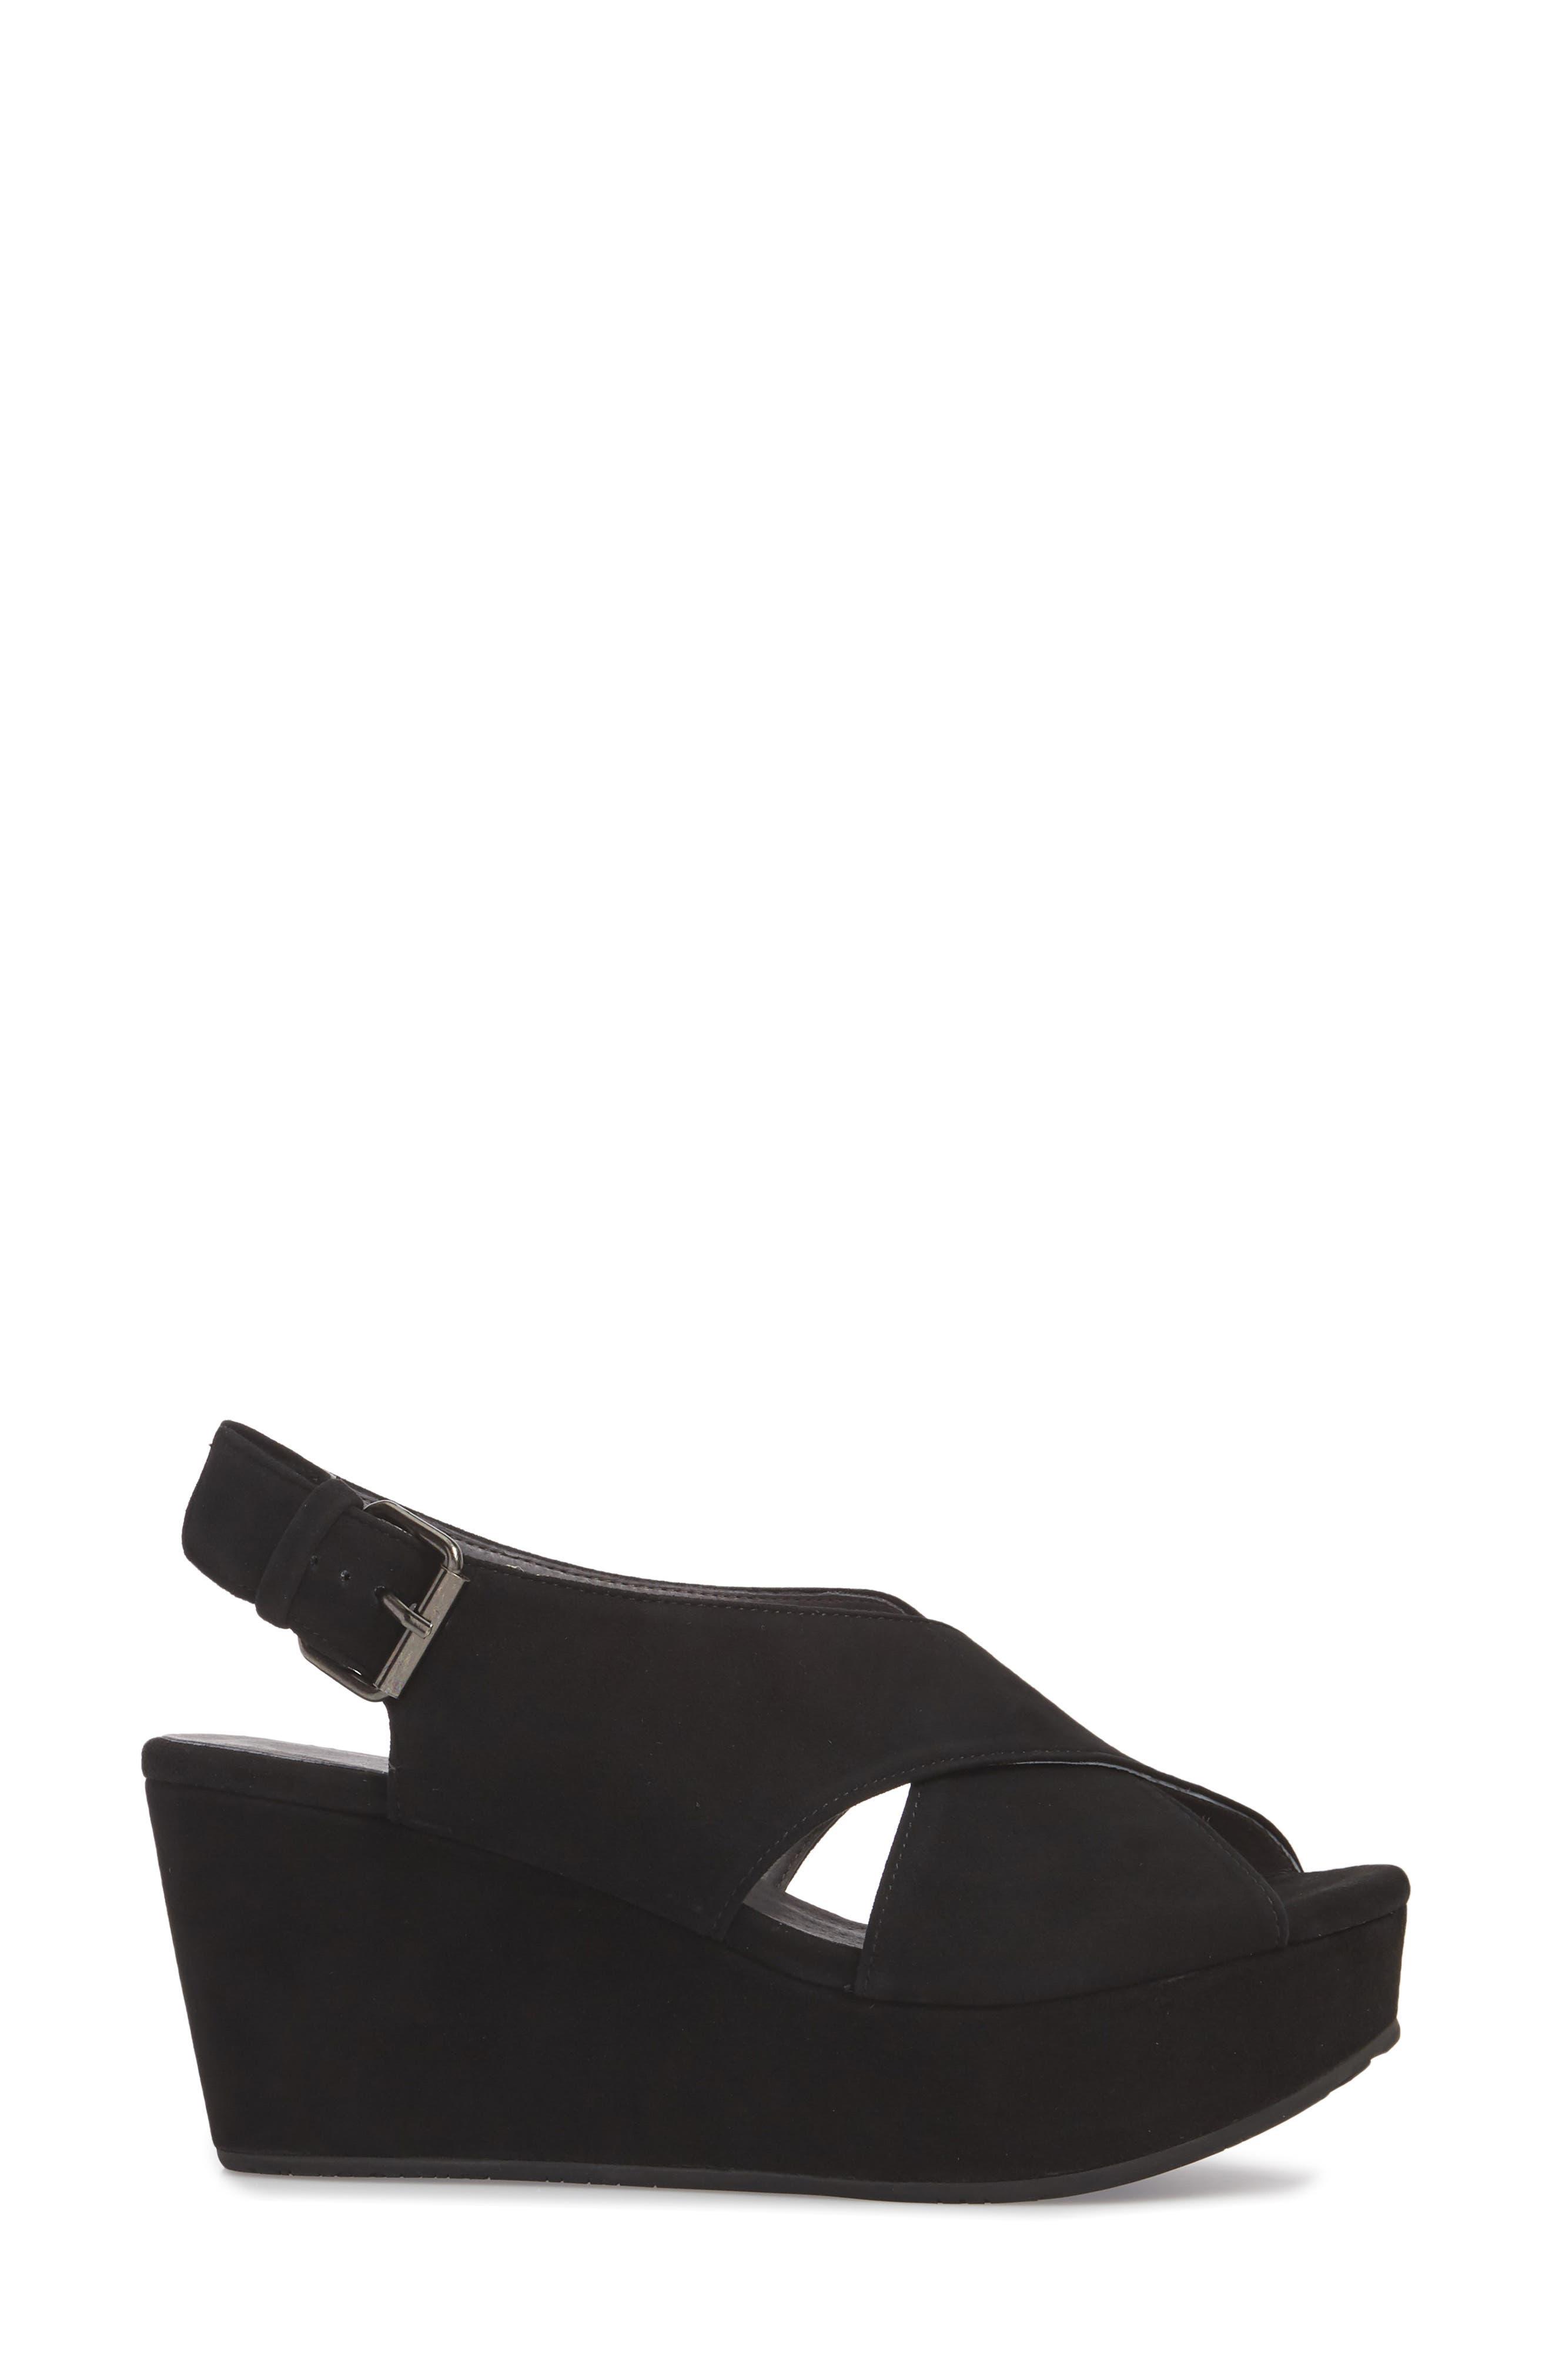 Wim Platform Wedge Sandal,                             Alternate thumbnail 3, color,                             BLACK SUEDE